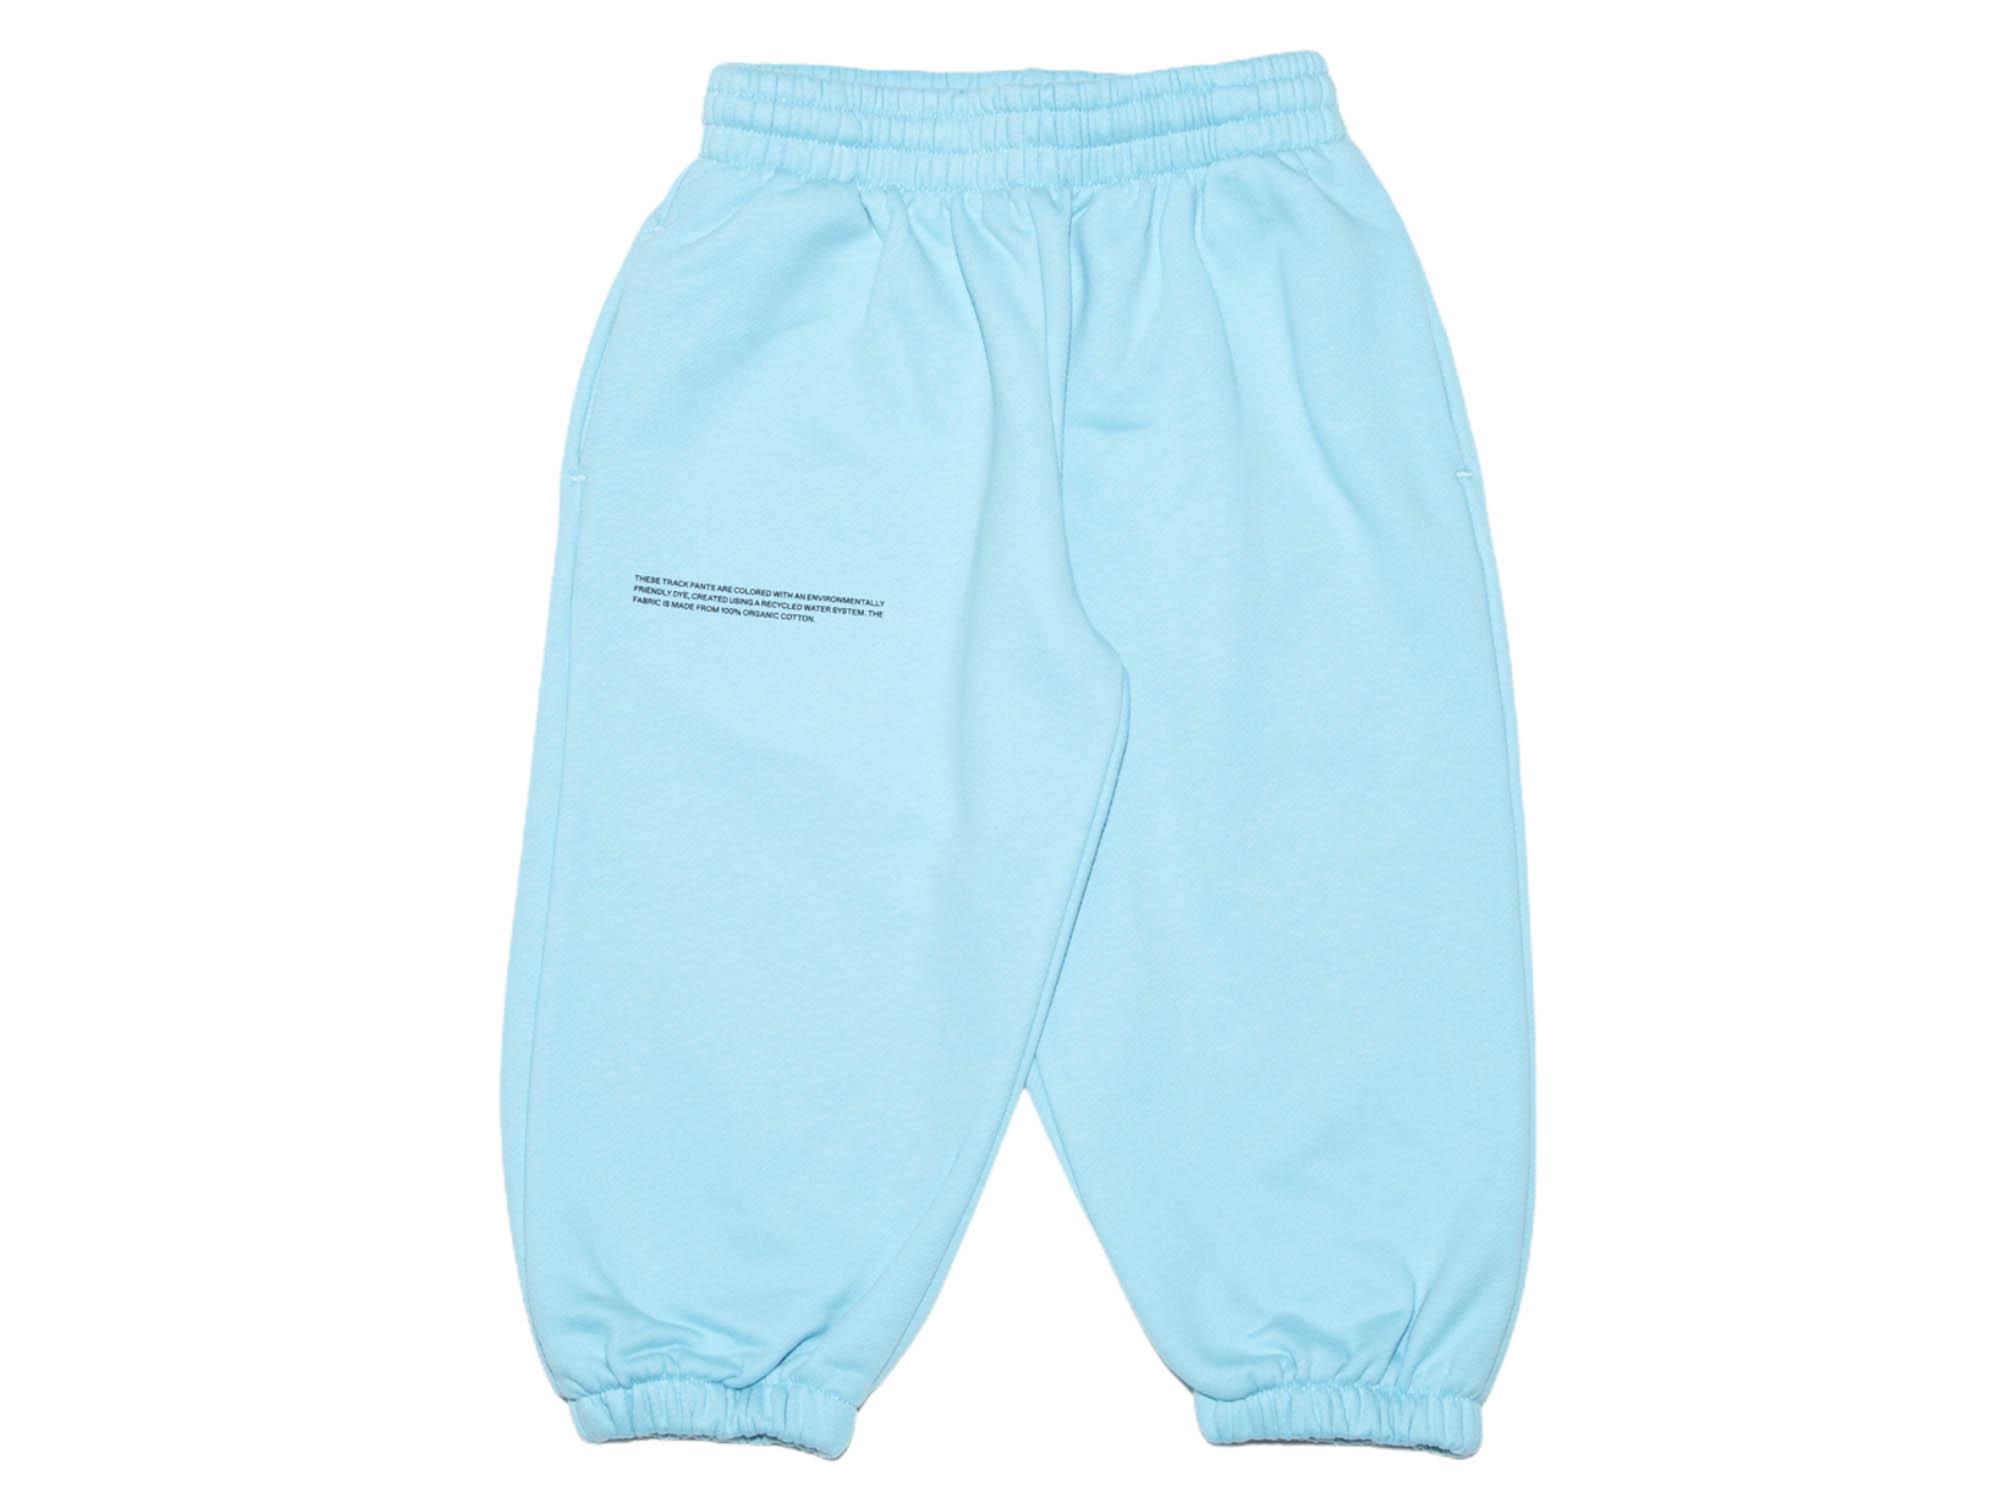 slide 1 - Celestial Blue Organic Cotton Track Pants